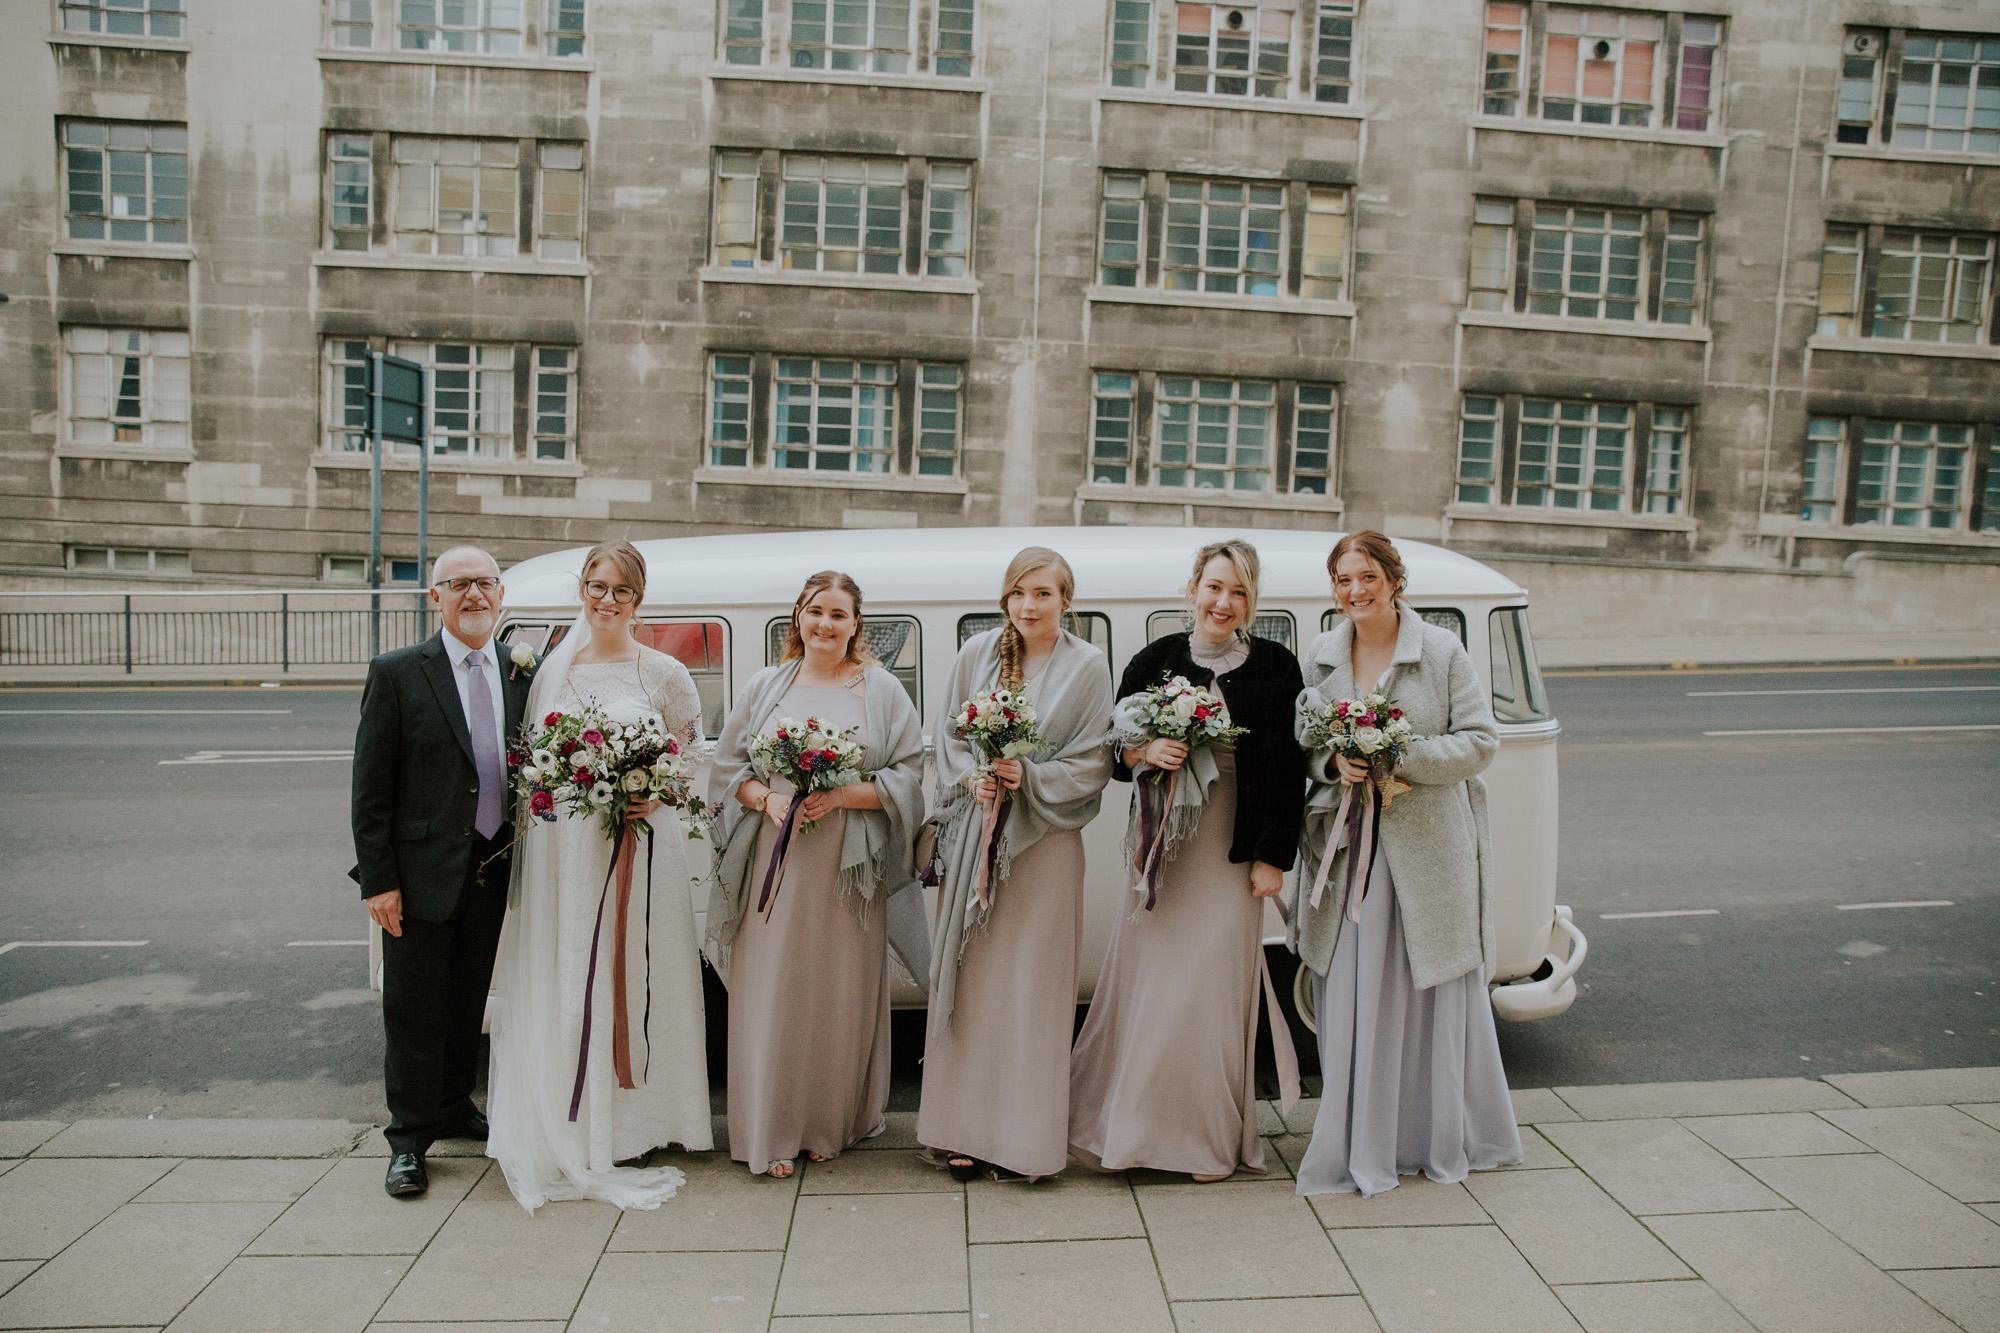 Kate-Beaumont-Bespoke-Bridal-Dahlia-Lace-Wedding-Gown-Cool-Leeds-Wedding-3.jpg